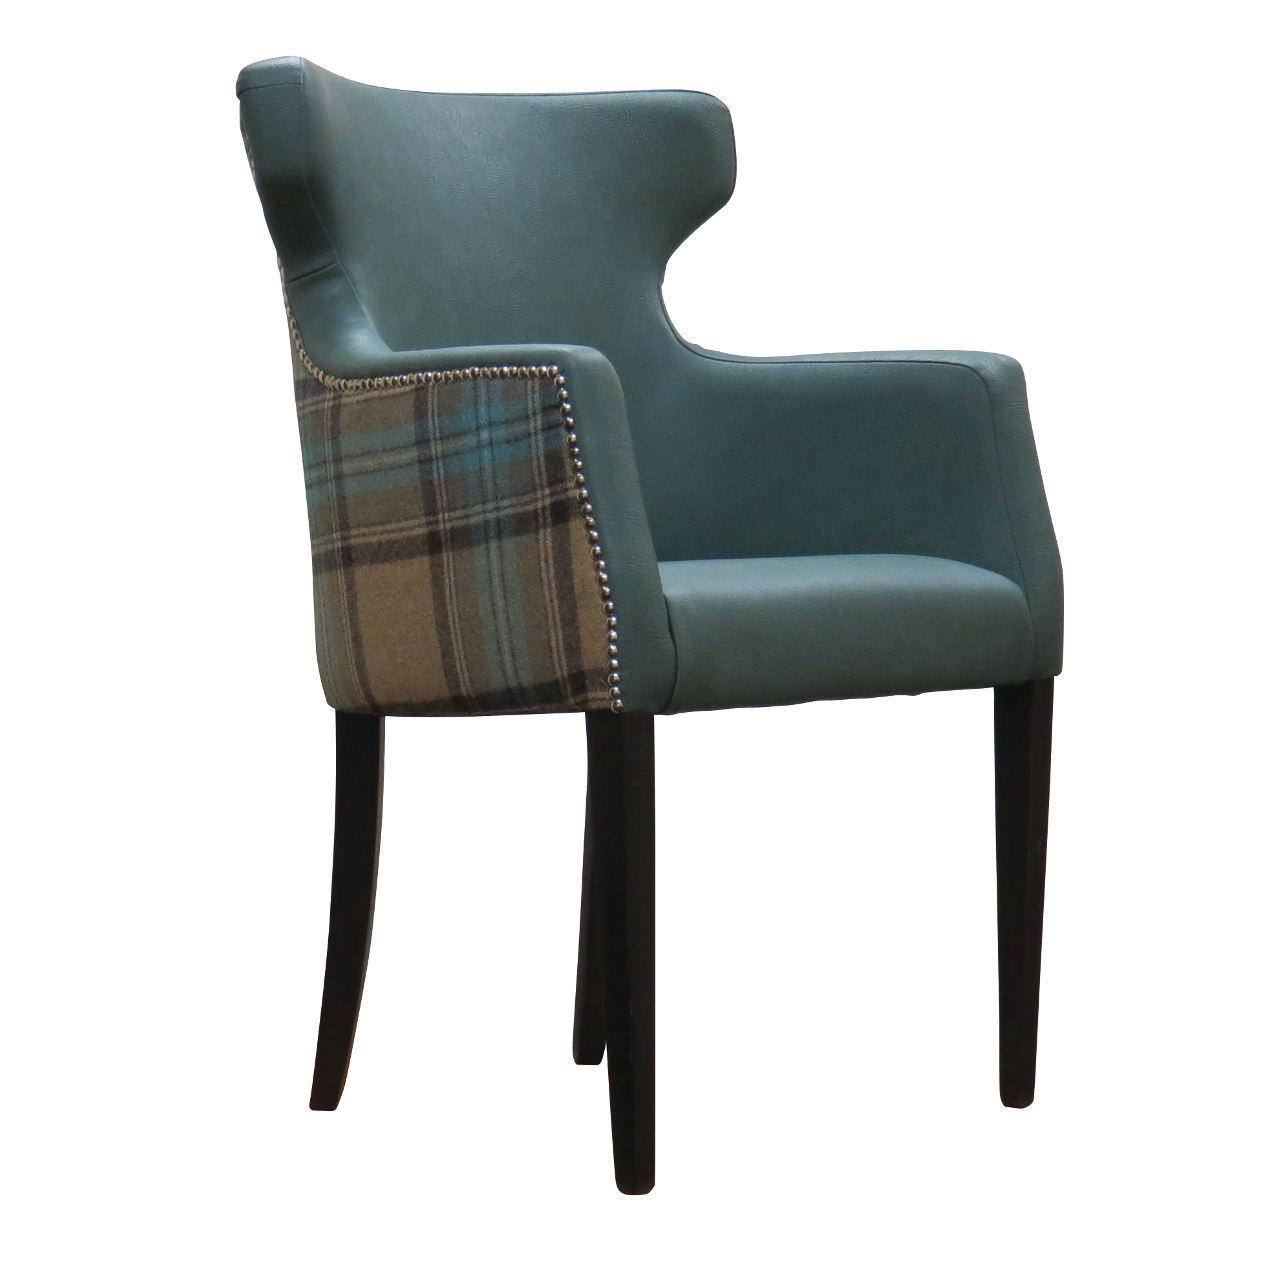 Omega curved armchair, bar furniture, restaurant furniture, hotel furniture, workplace furniture, contract furniture, office furniture